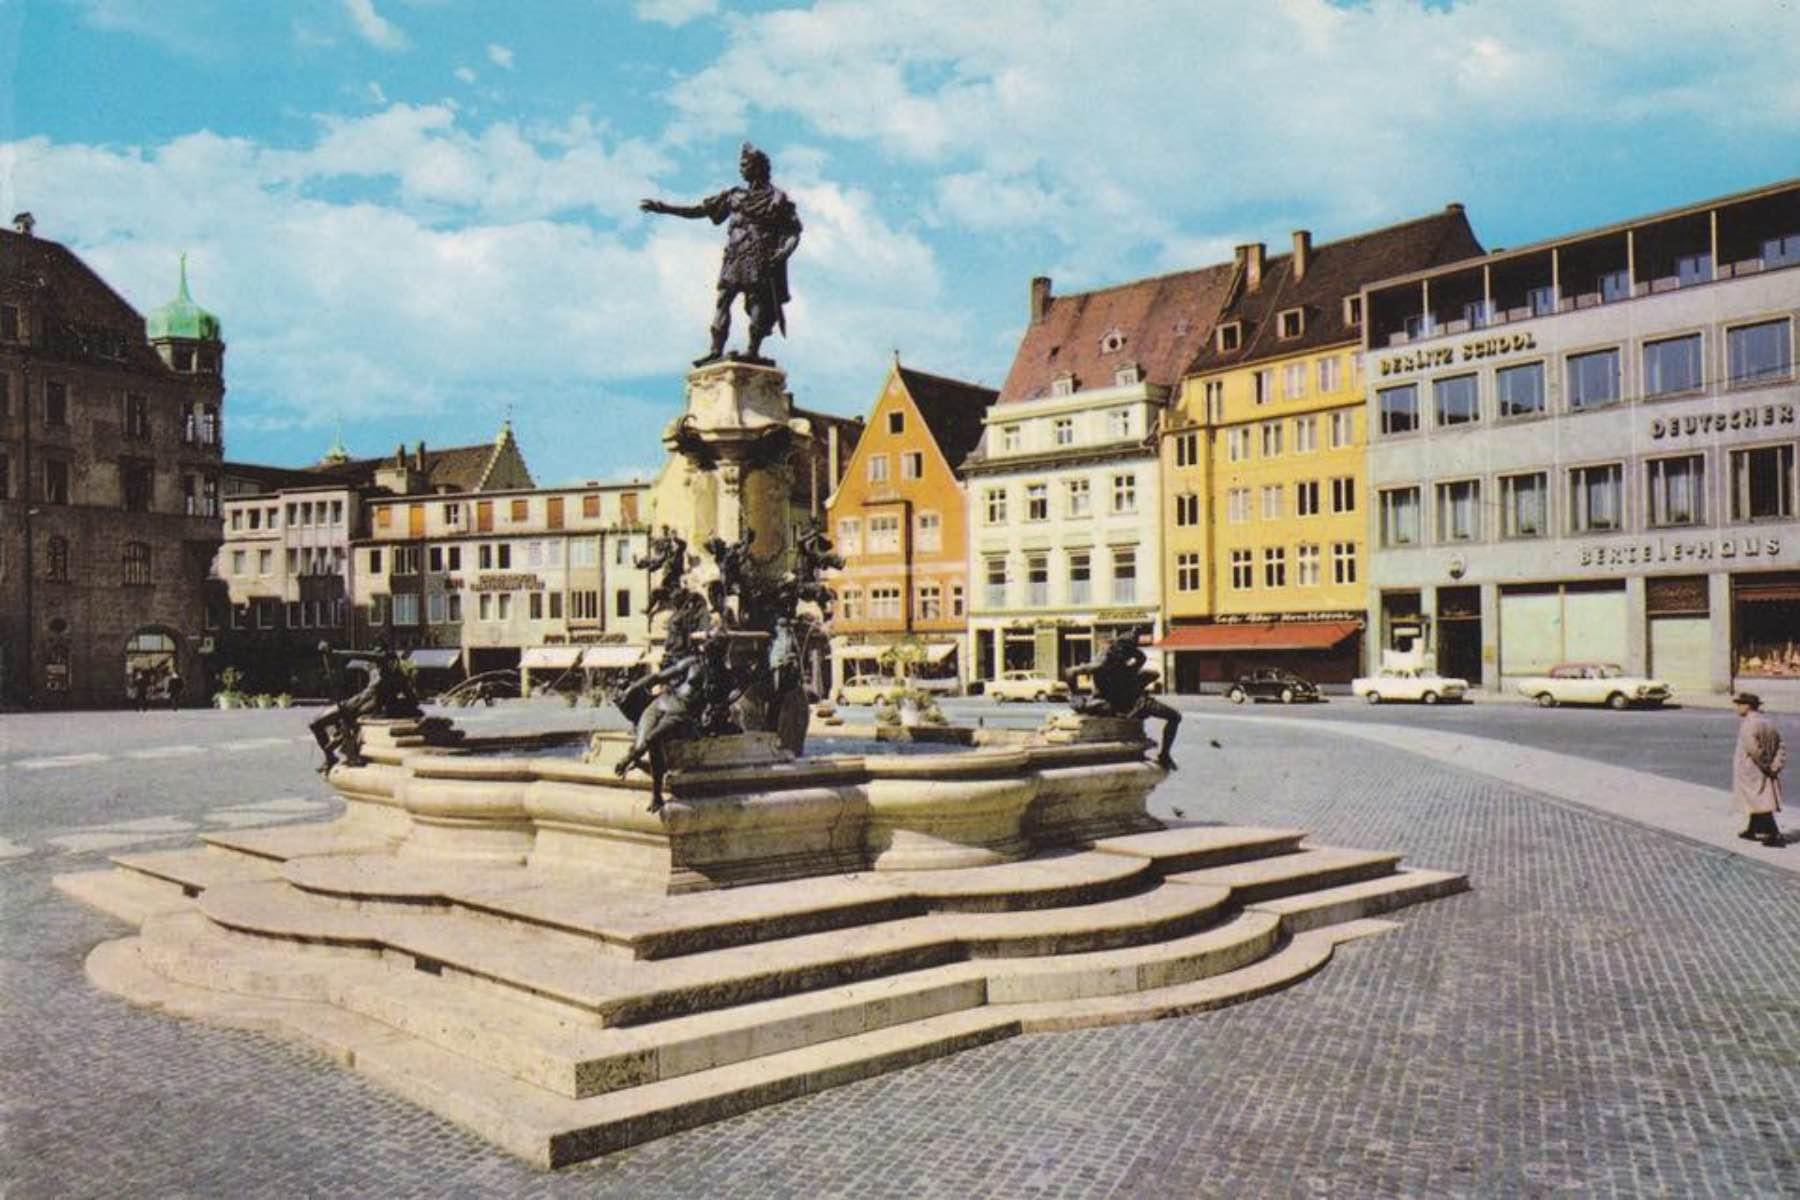 geheimtipp Augsburg Rathausplatz – ©Privatsammlung: Gregor Nagler